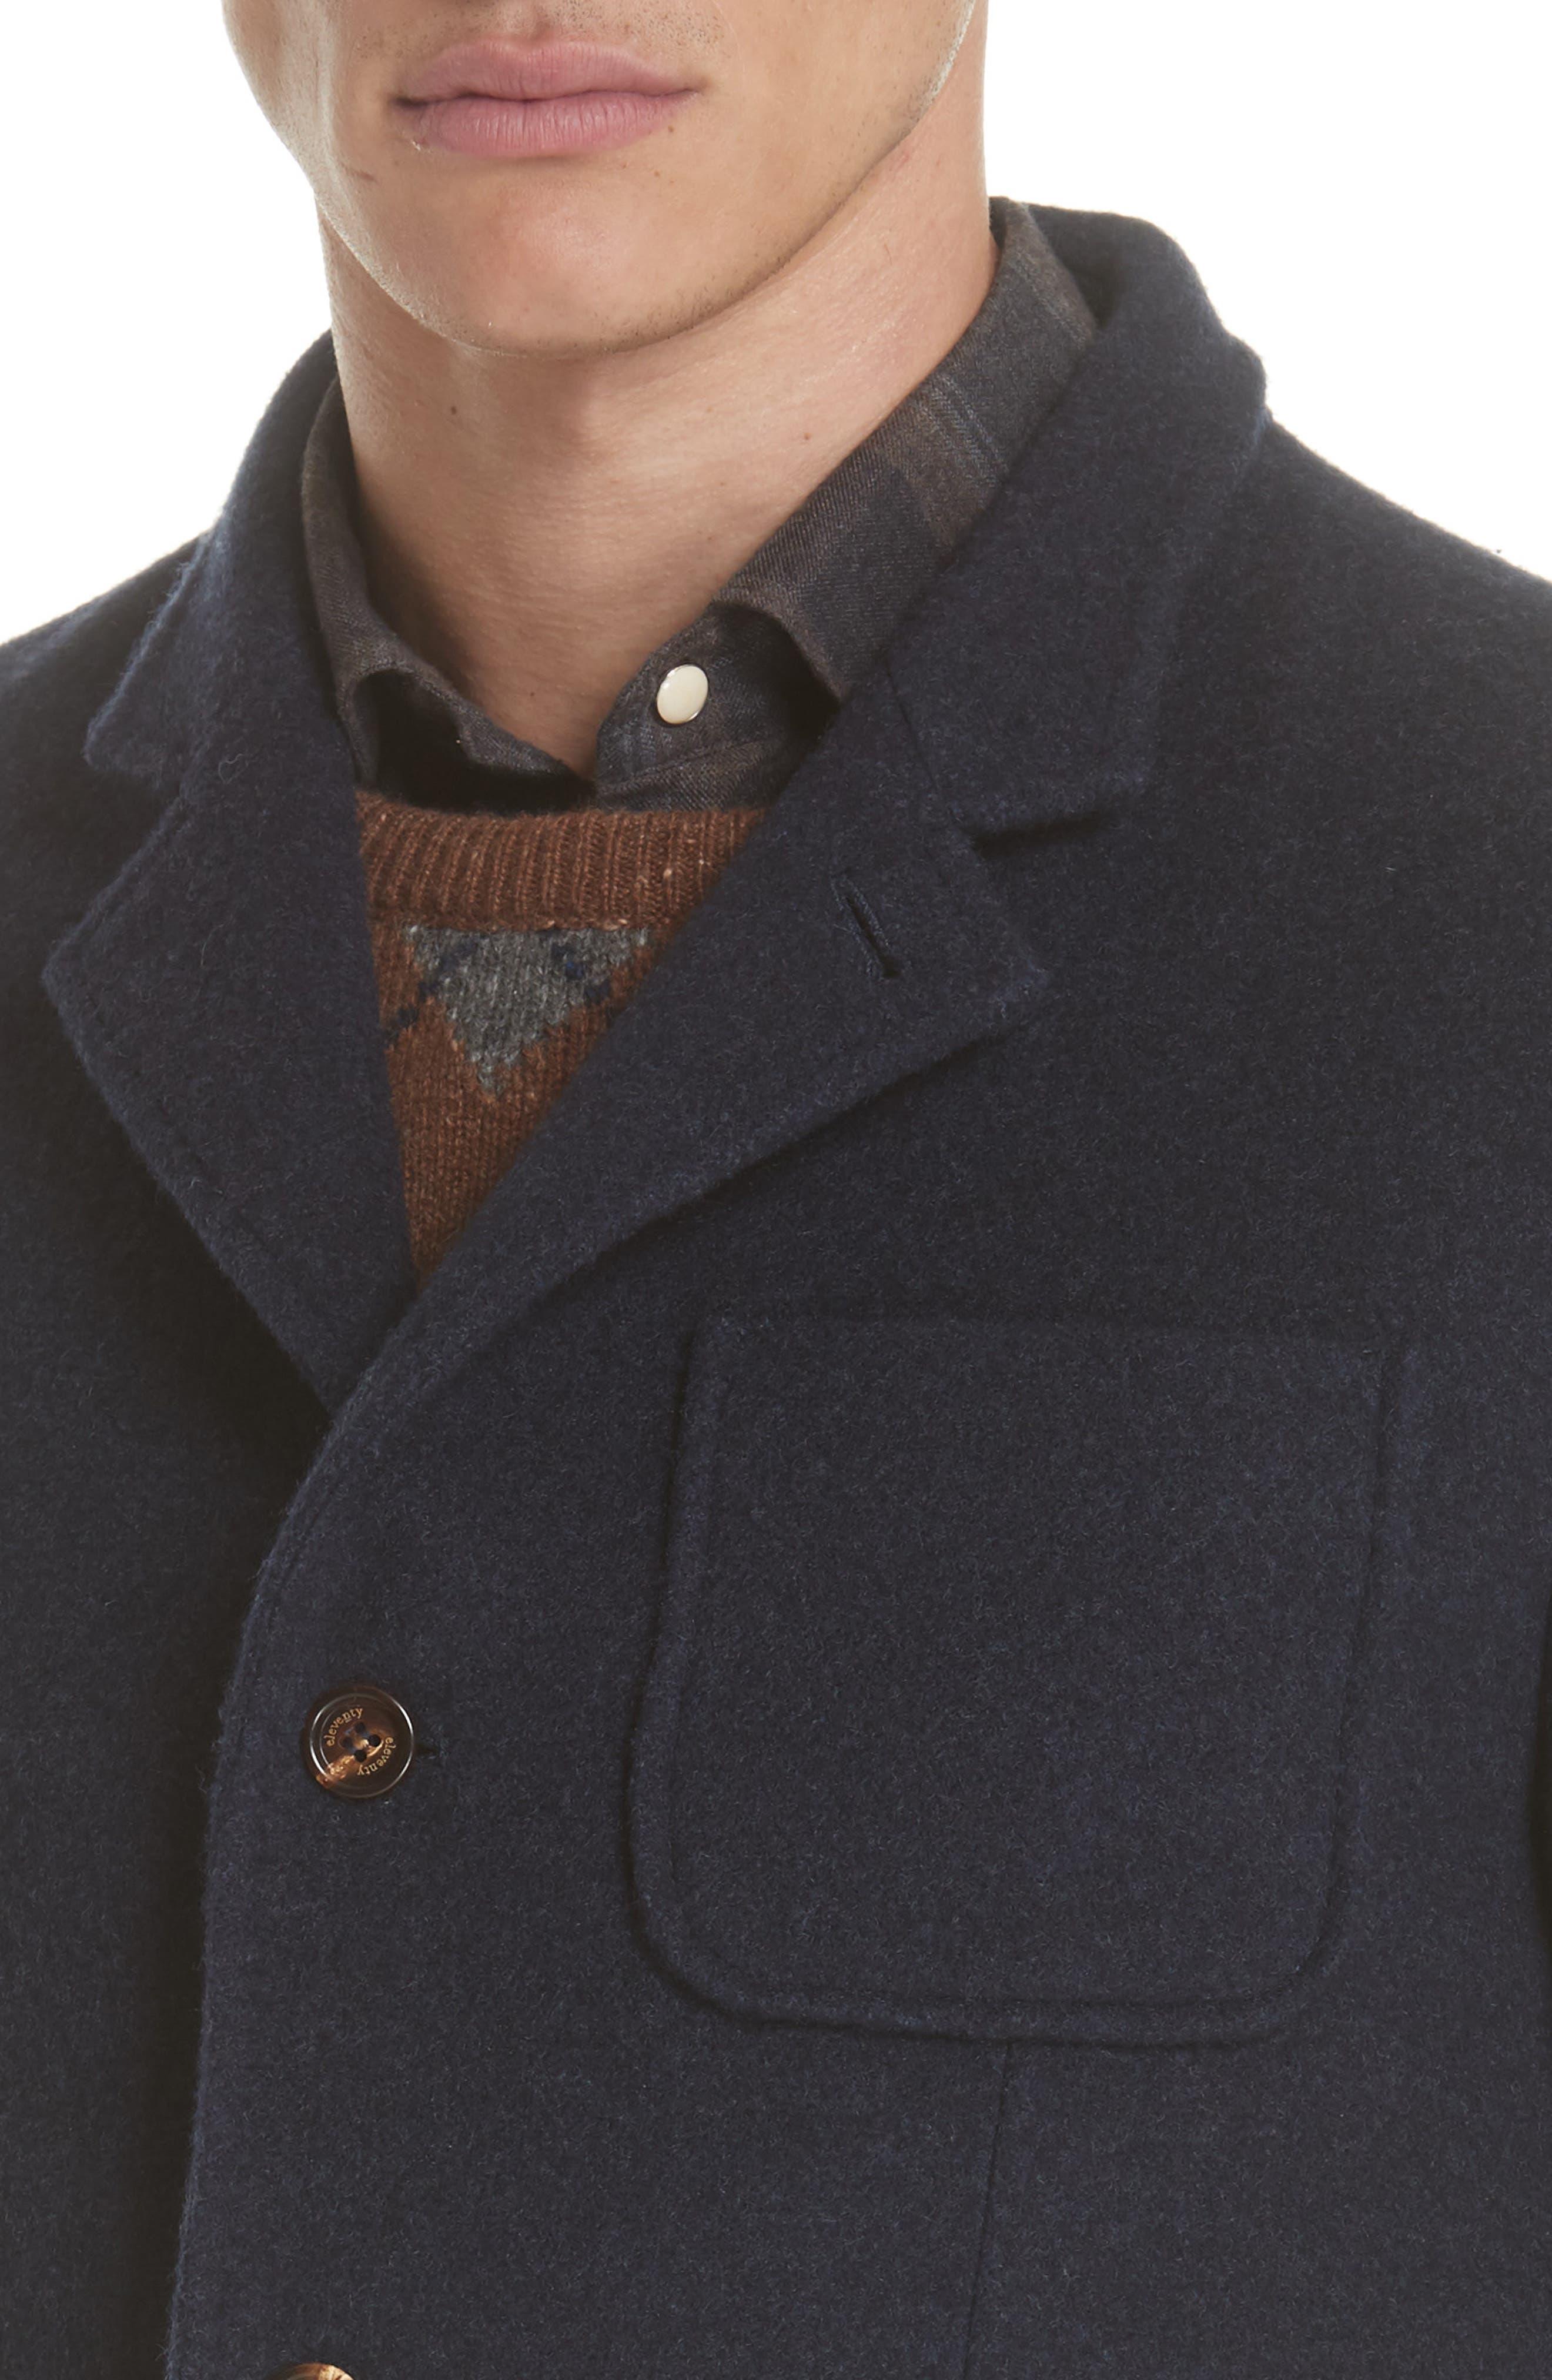 Wool & Cashmere Coat,                             Alternate thumbnail 4, color,                             NAVY